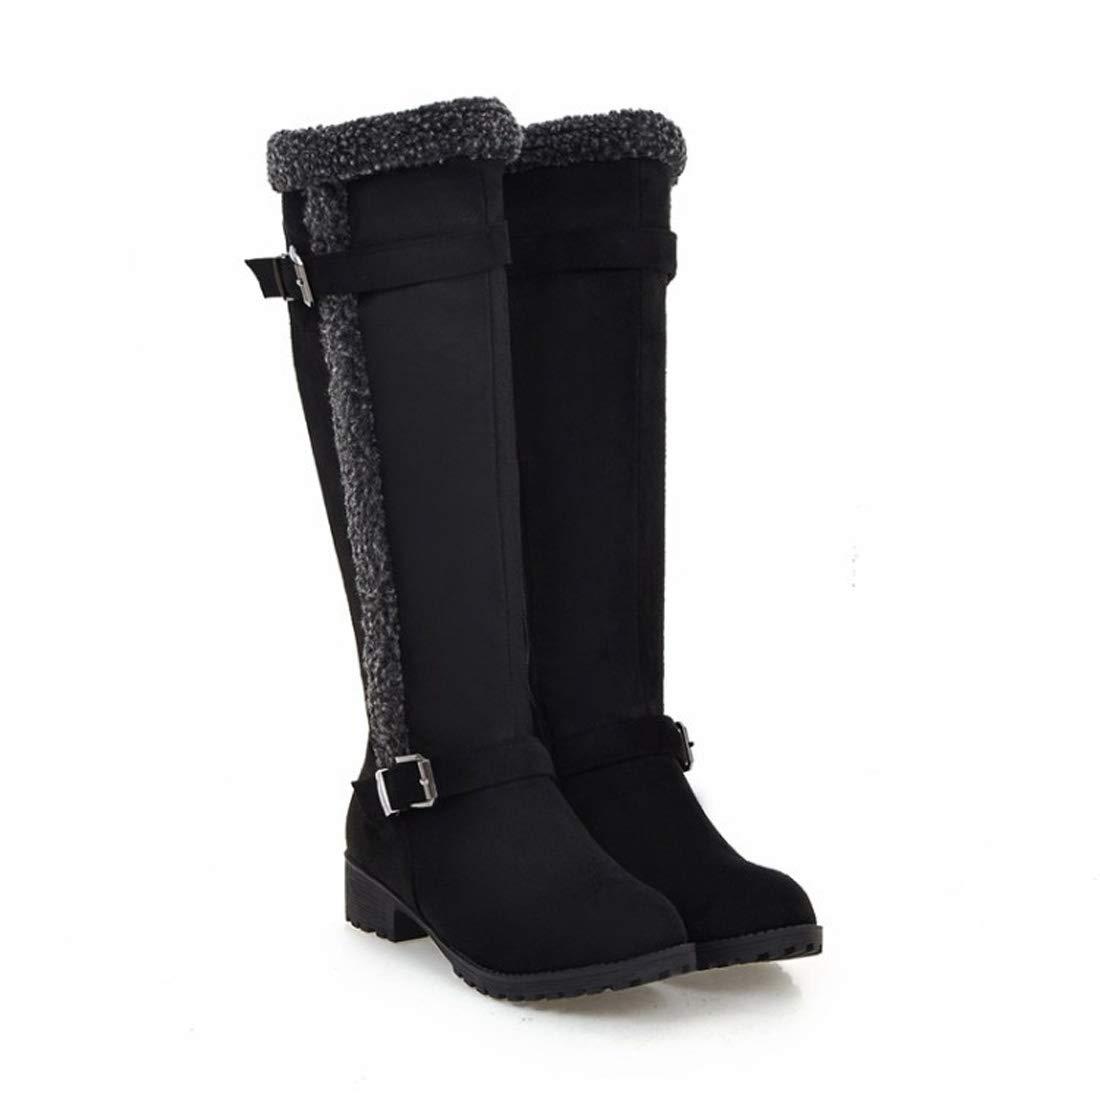 DANDANJIE Damen Stiefel Flache Ferse Runde Kappe Stiefel Komfort Große Schuhe für 2018 Herbst & Winter